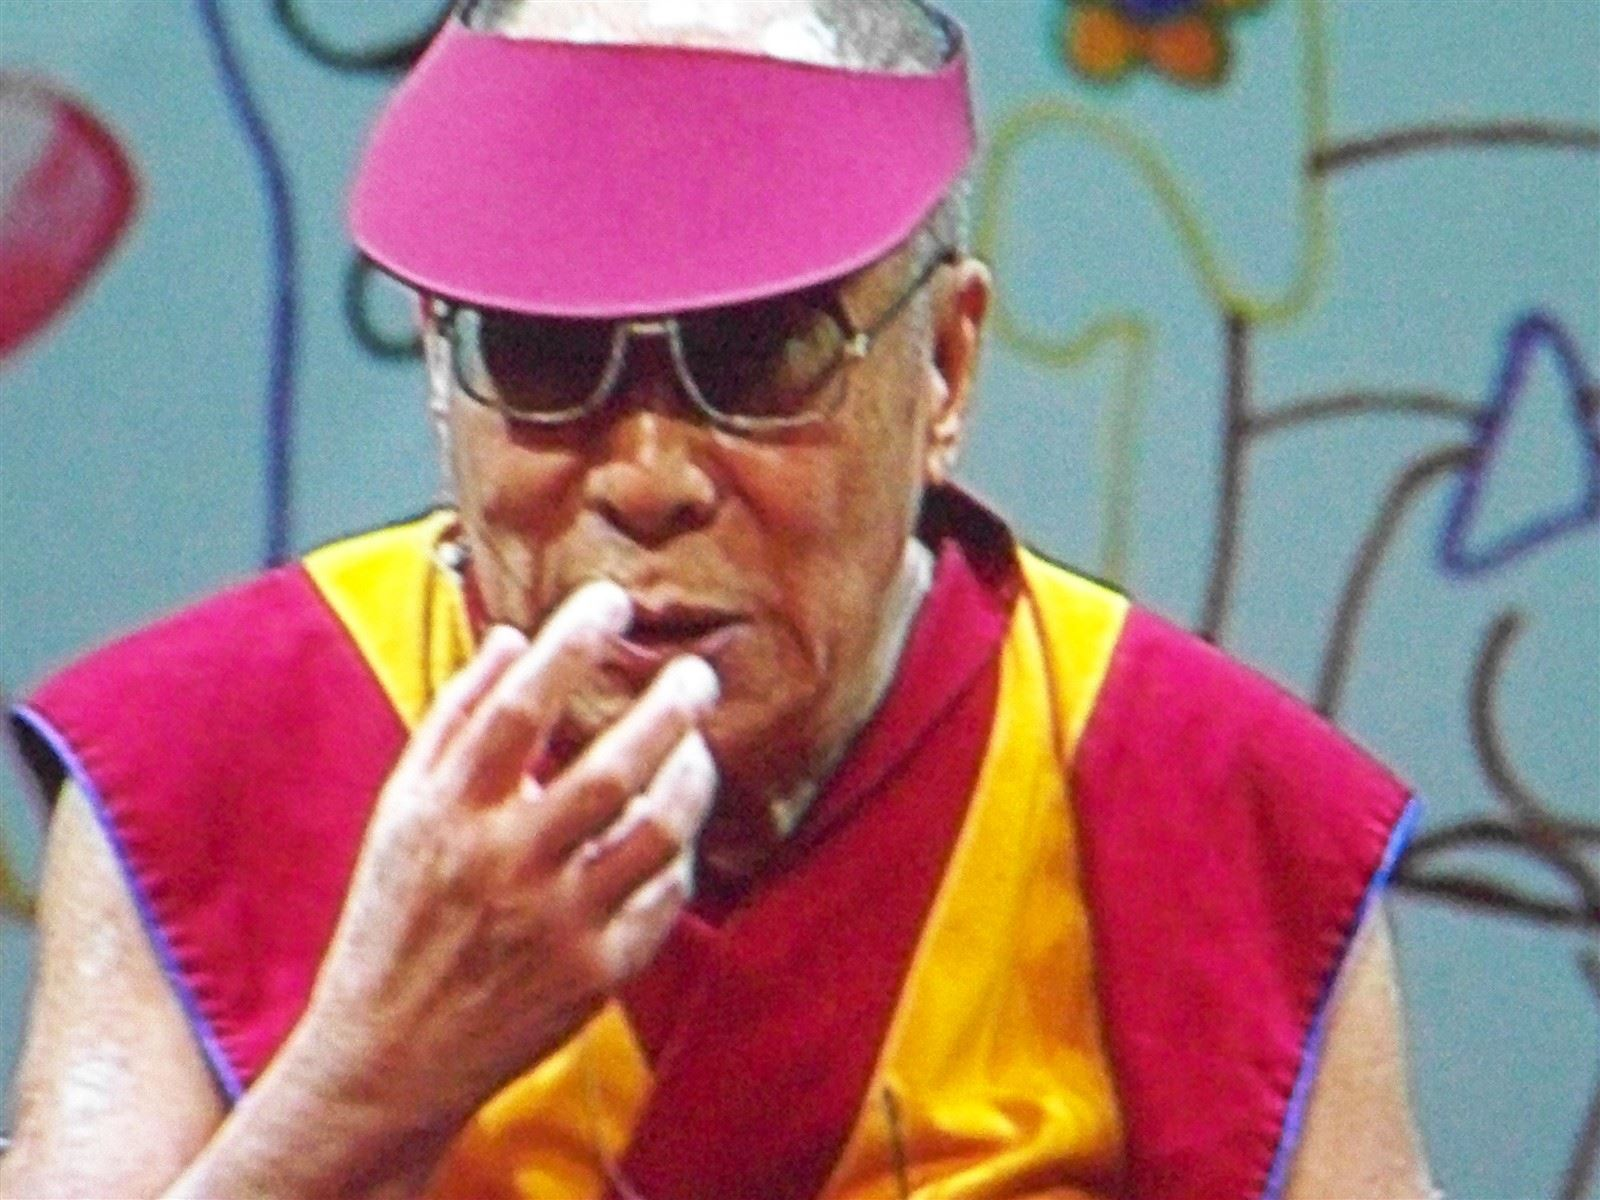 His Holiness the Dalai Lama : His Holiness the Dalai Lama @Newark Peace, May 2011